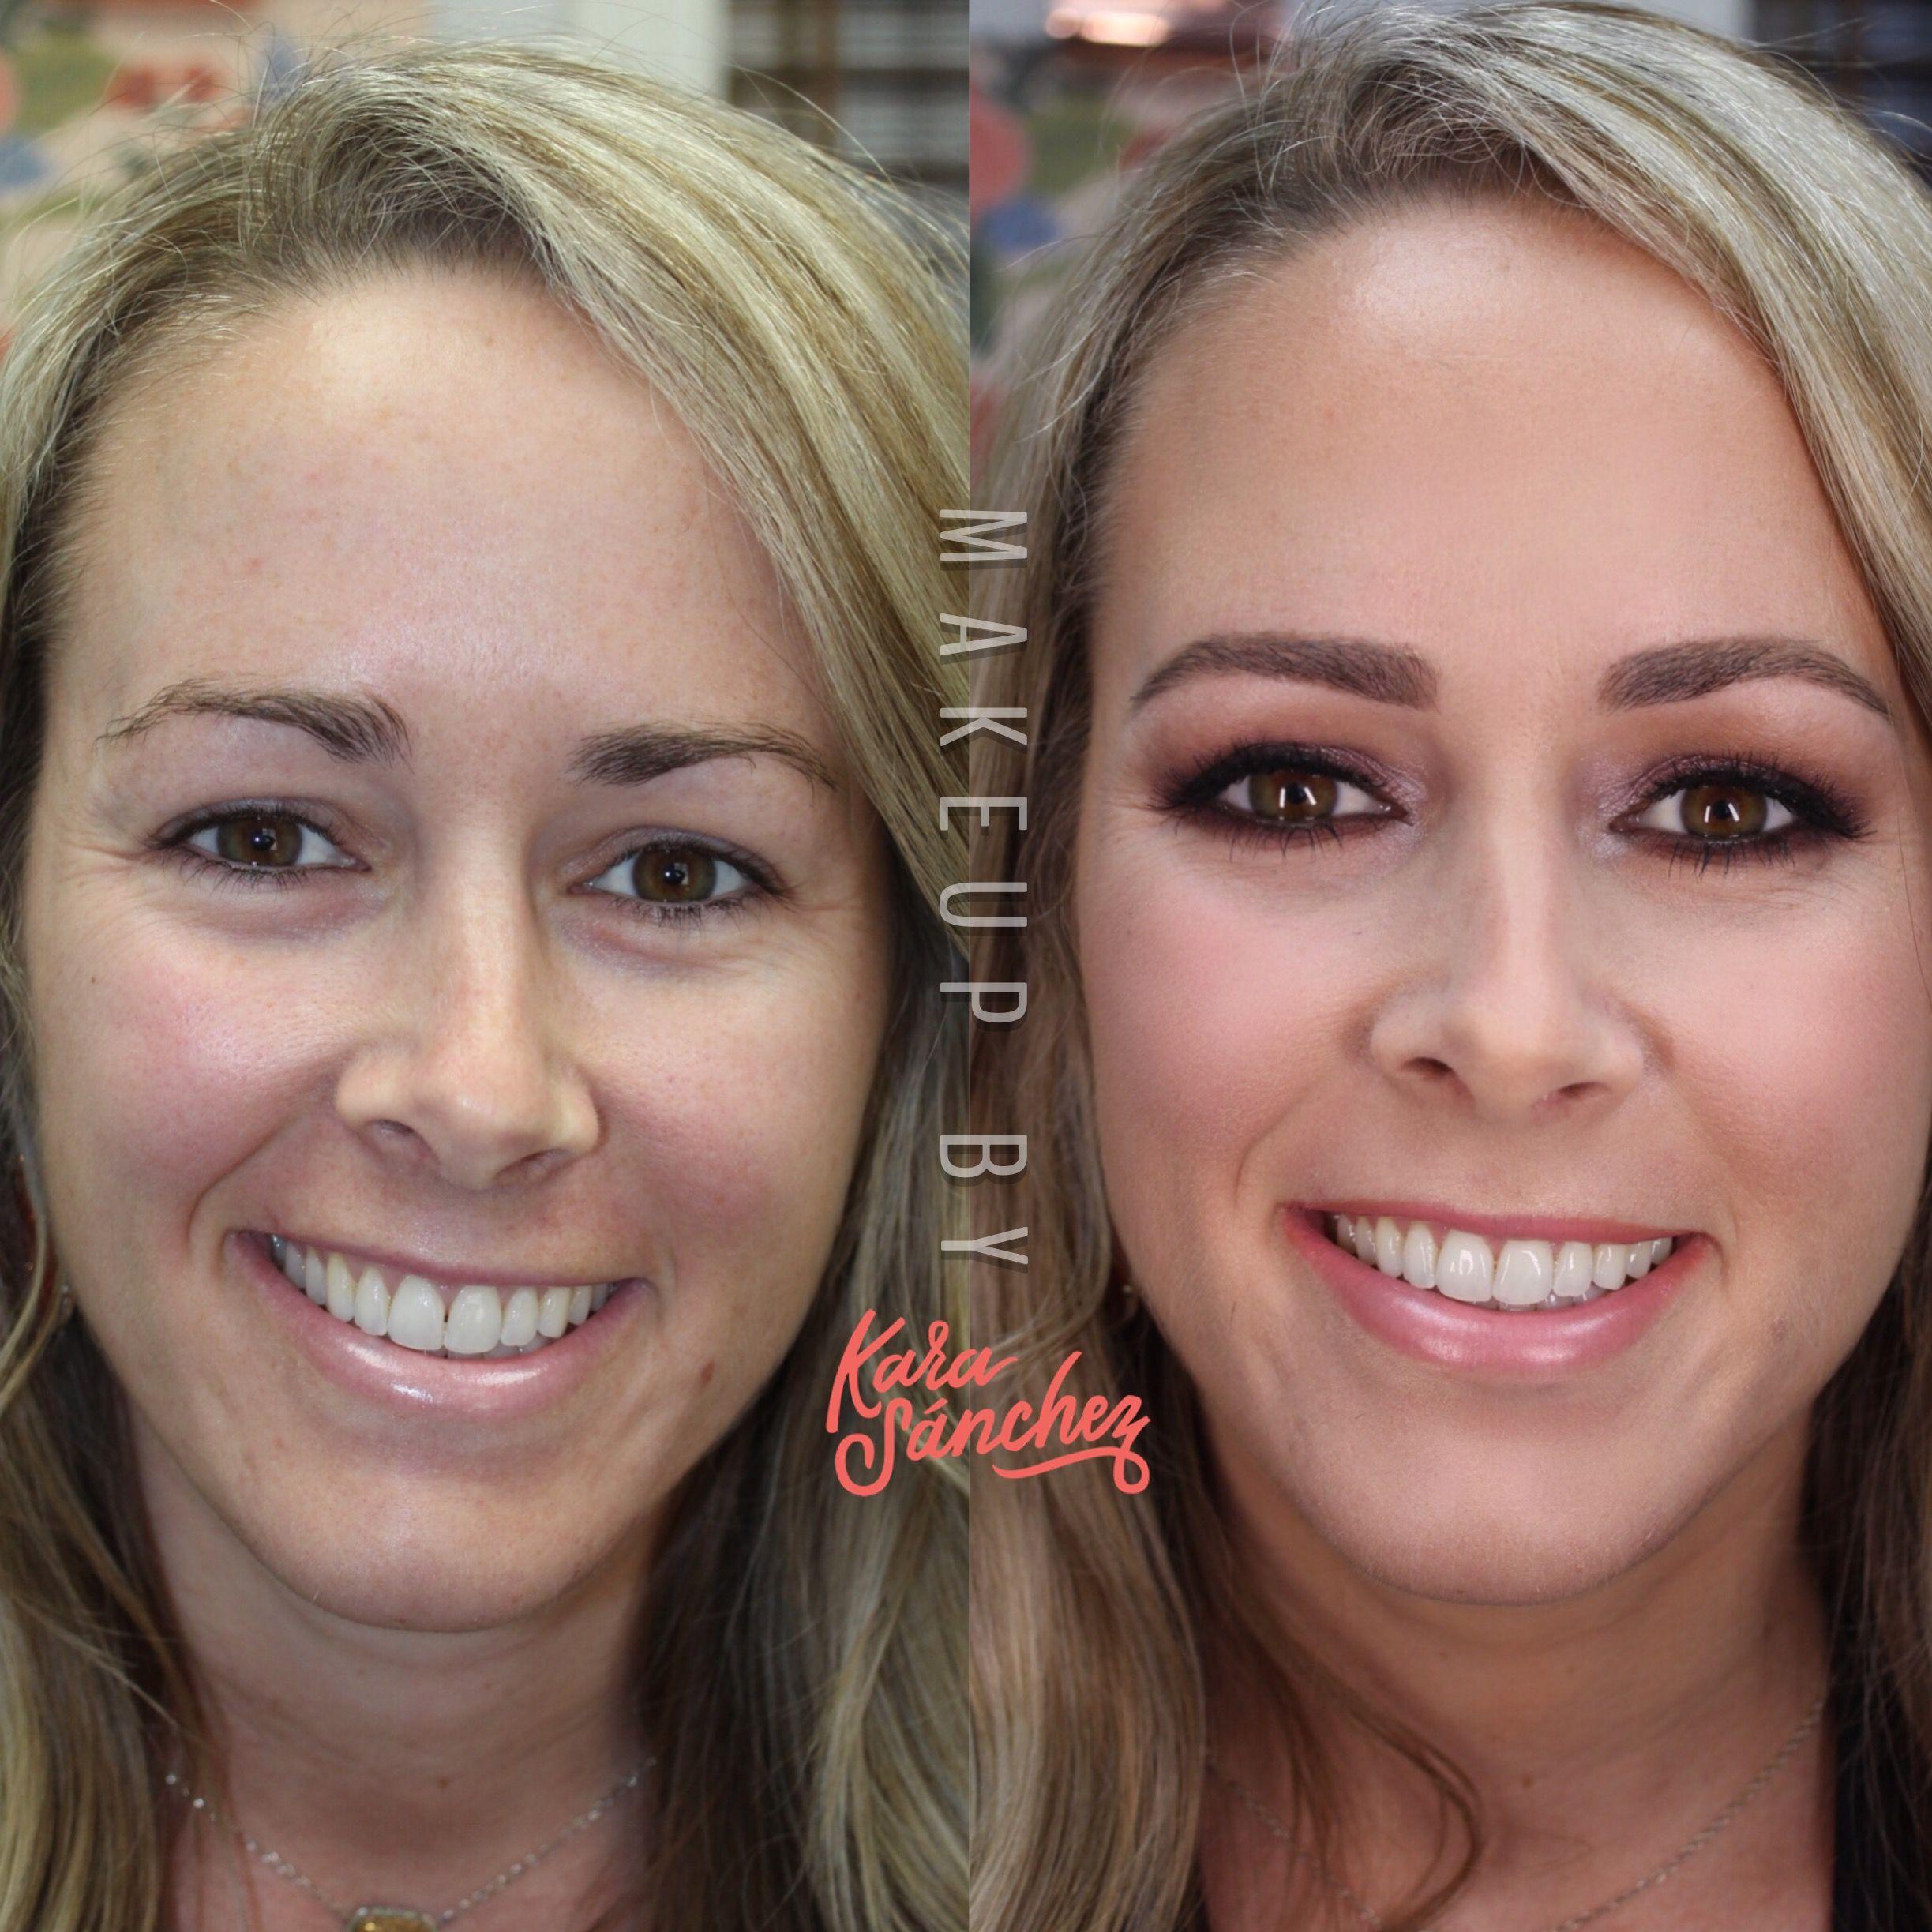 MAKEUP BAG MAKEOVER with Kara Sánchez Permanent eyebrows